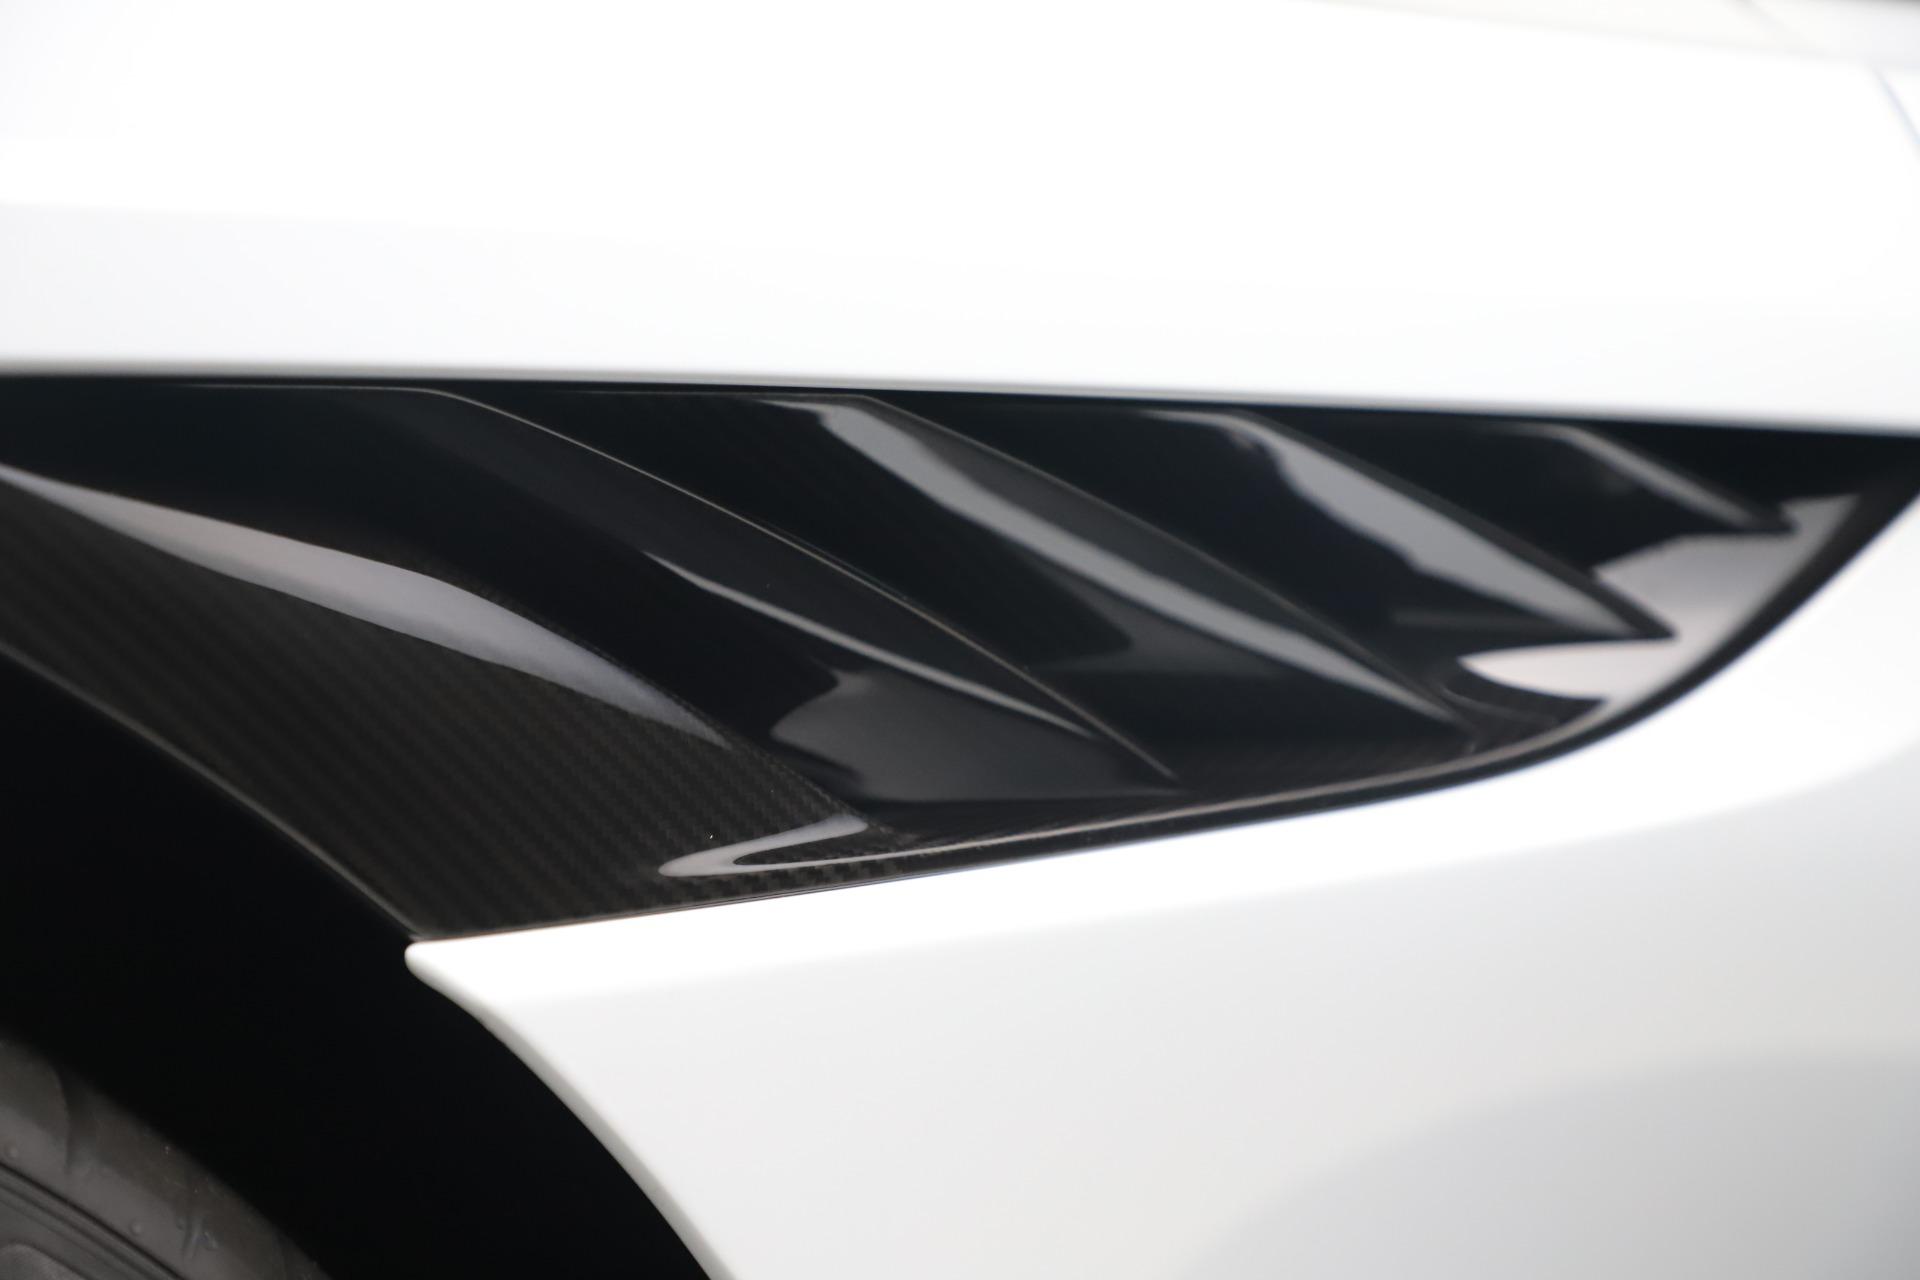 New 2020 Aston Martin DBS Superleggera For Sale In Greenwich, CT 3484_p34